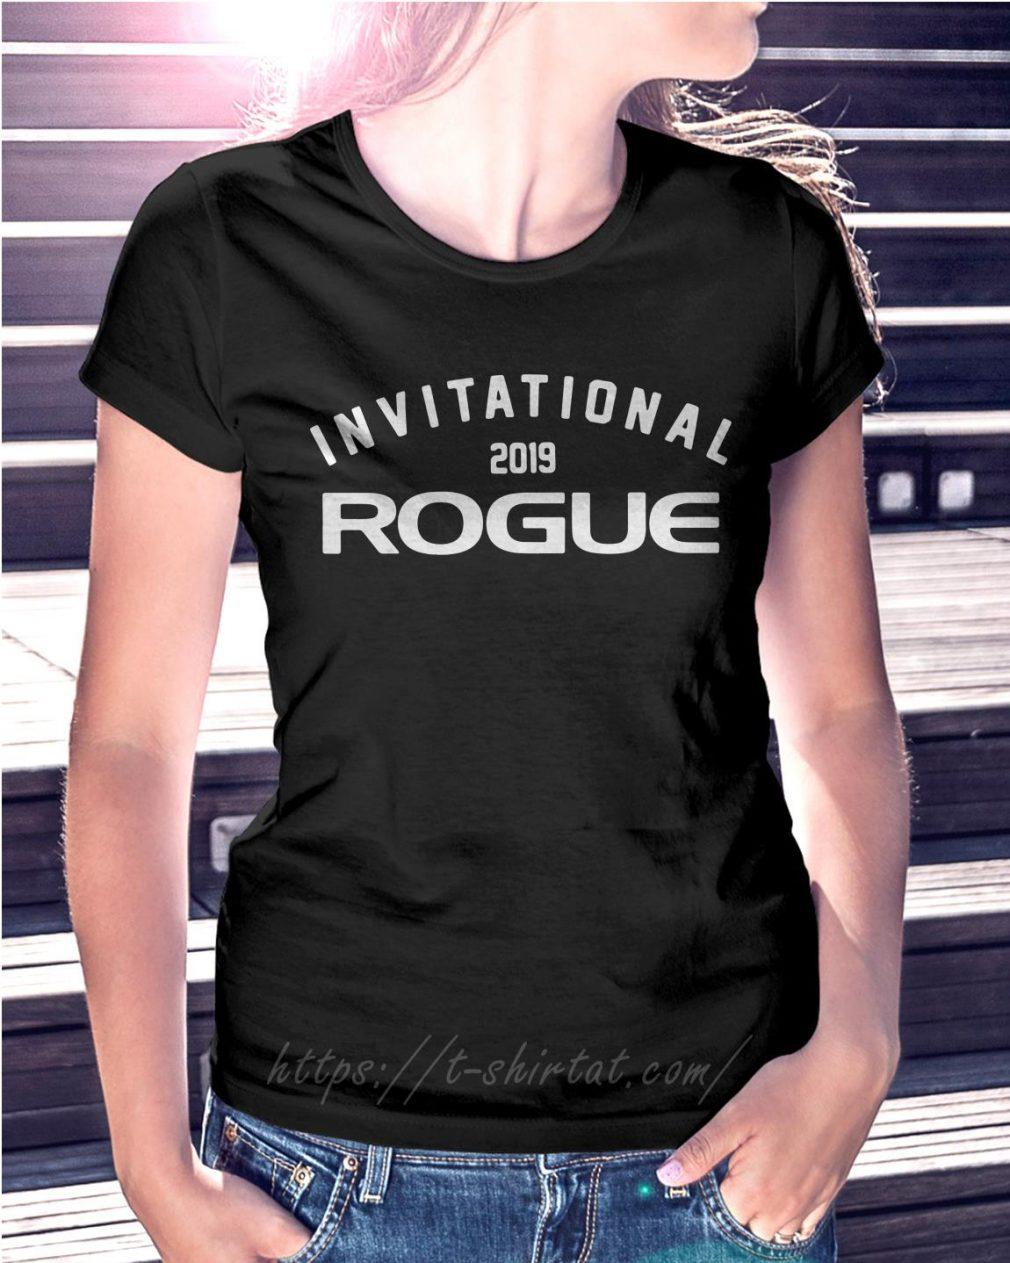 Invitational rogue 2019